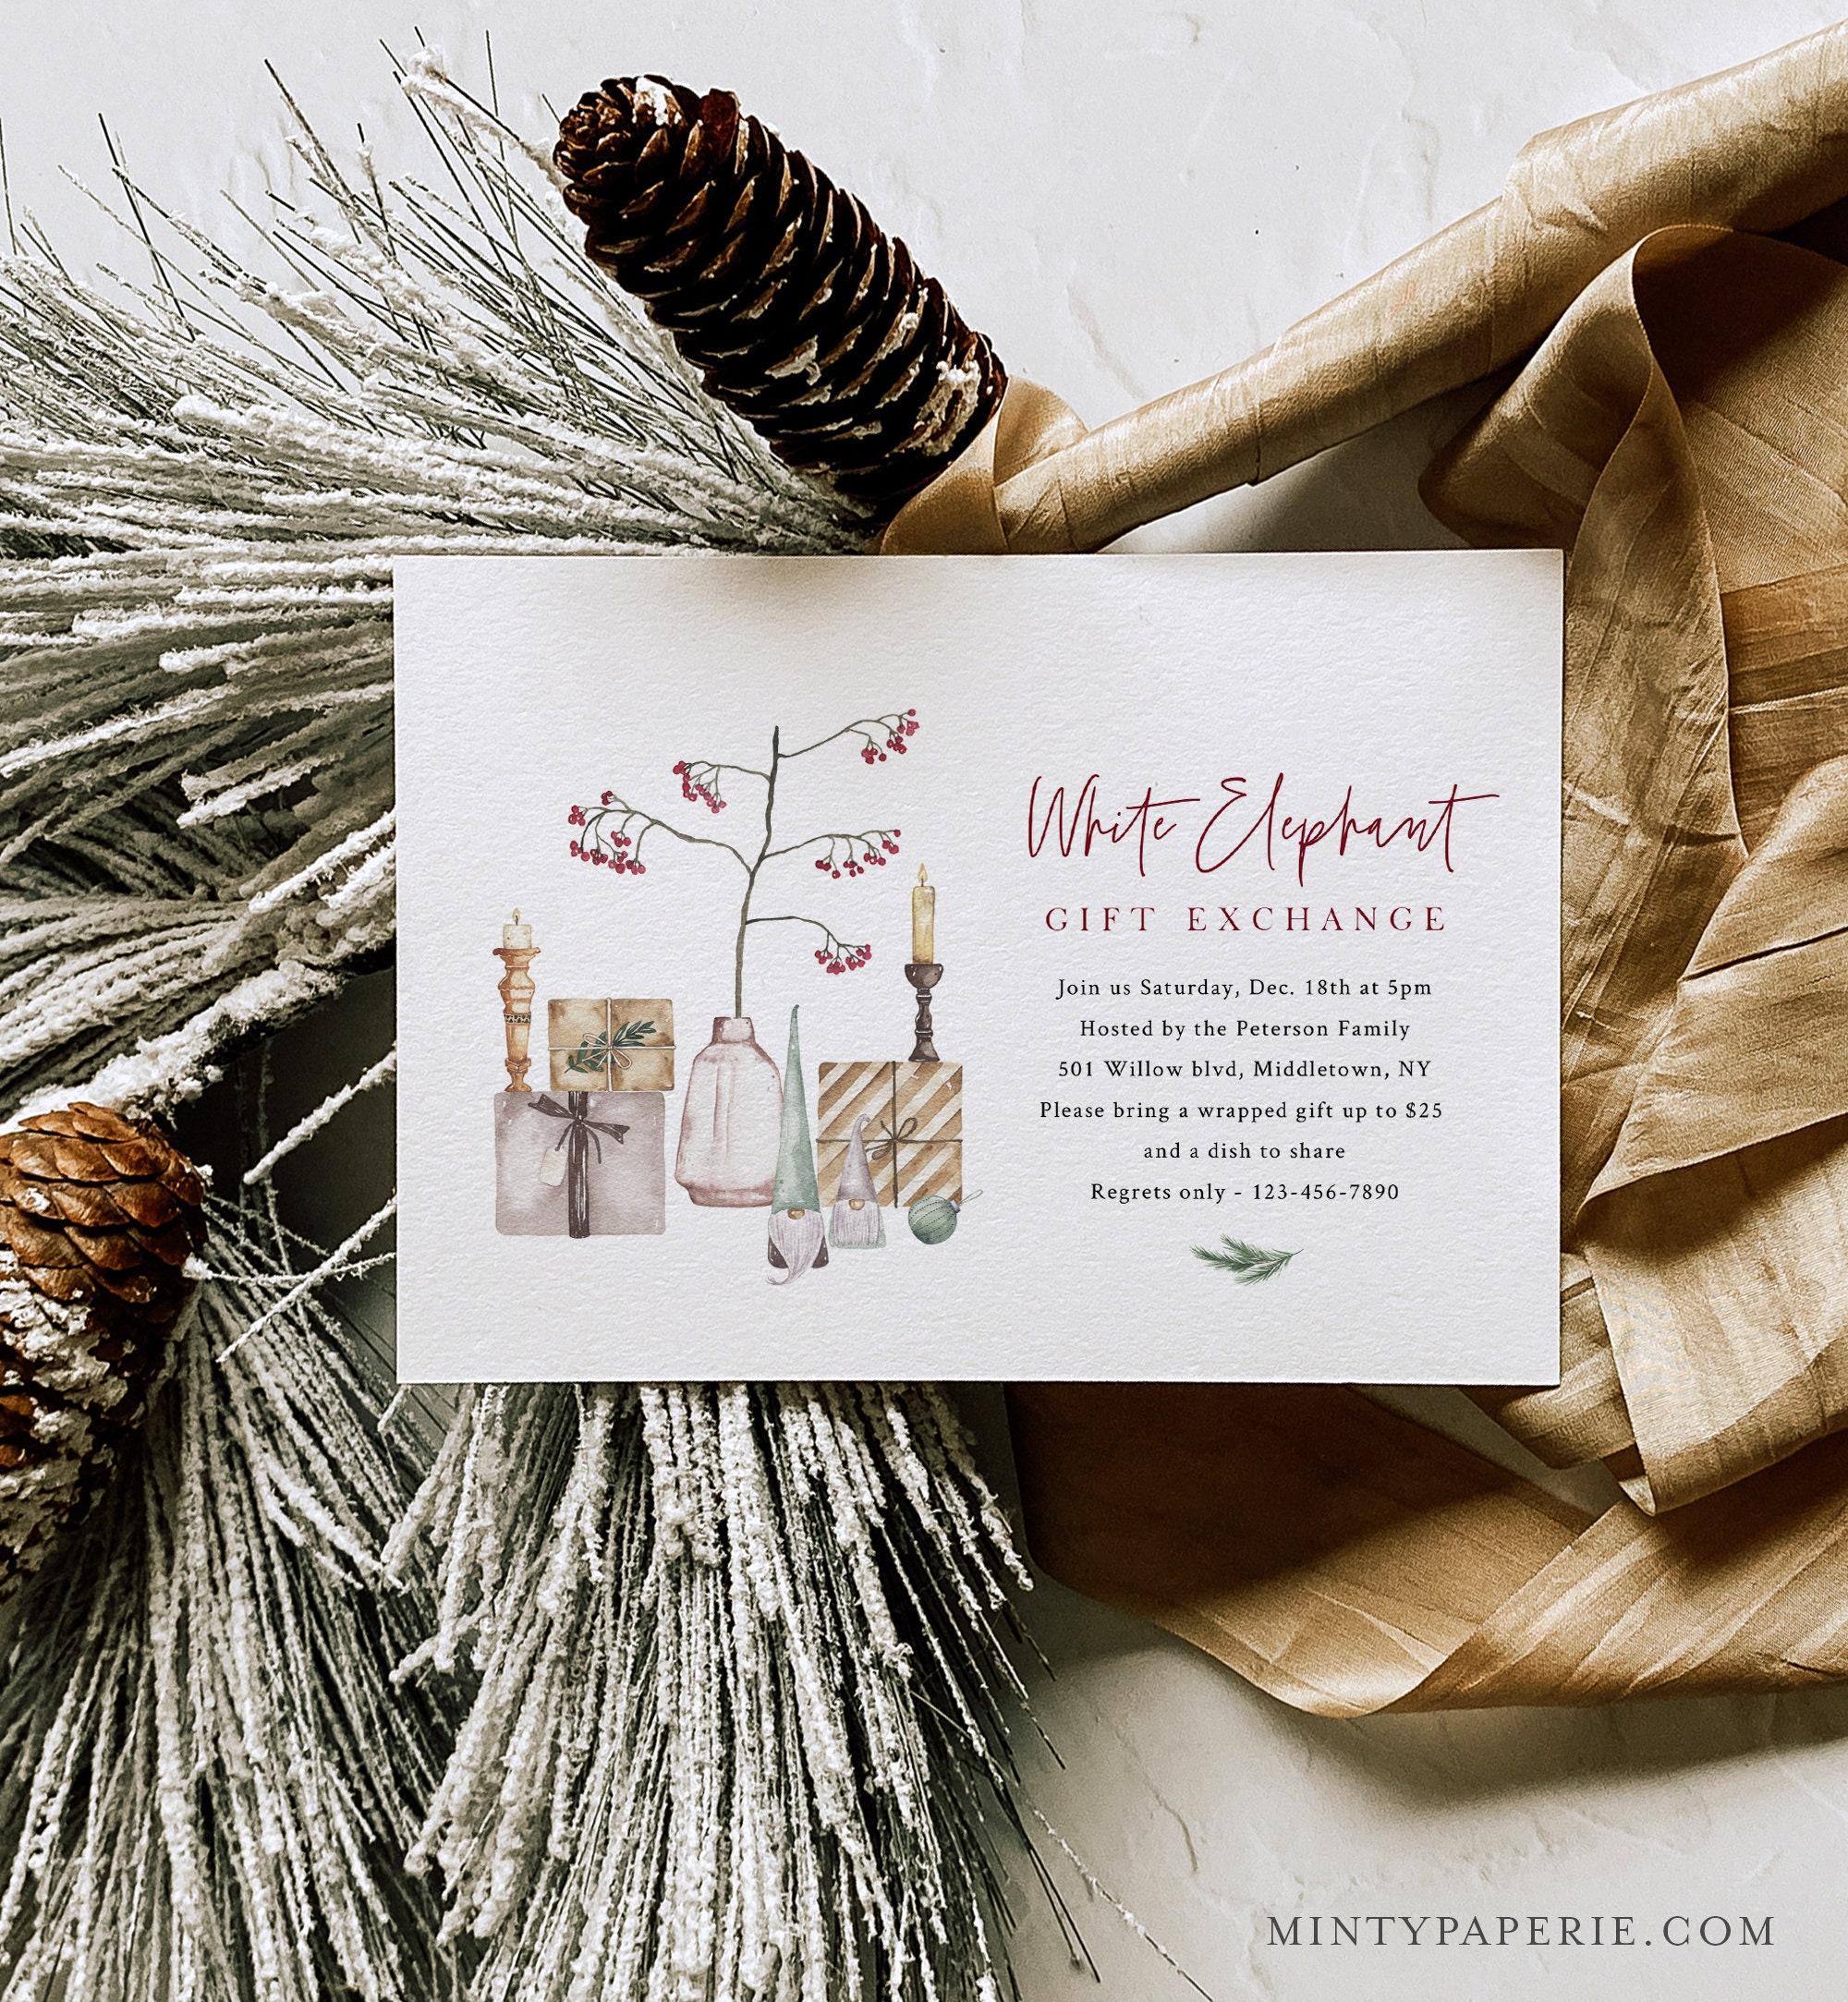 White Elephant Party Invitation Template, Secret Santa, Gift ...